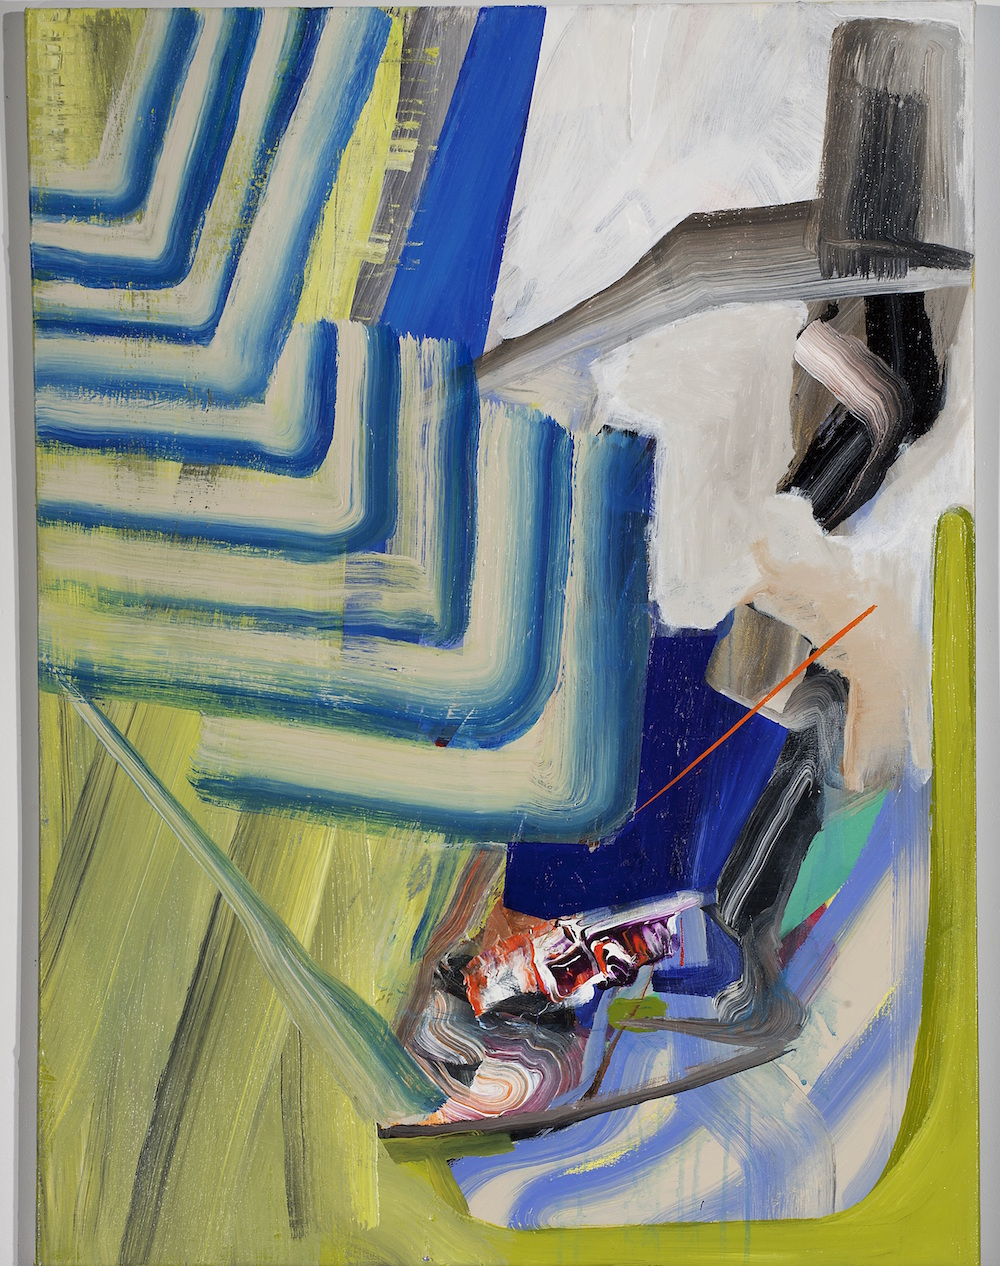 "MATTHEW CHOBERKA, Encroachment, 2012 Acrylique sur toile / Acrylic on canvas - 101.6 x 76.2 cm / 40"" by 30"" USD $2,950 (avec encadrement / framed)"